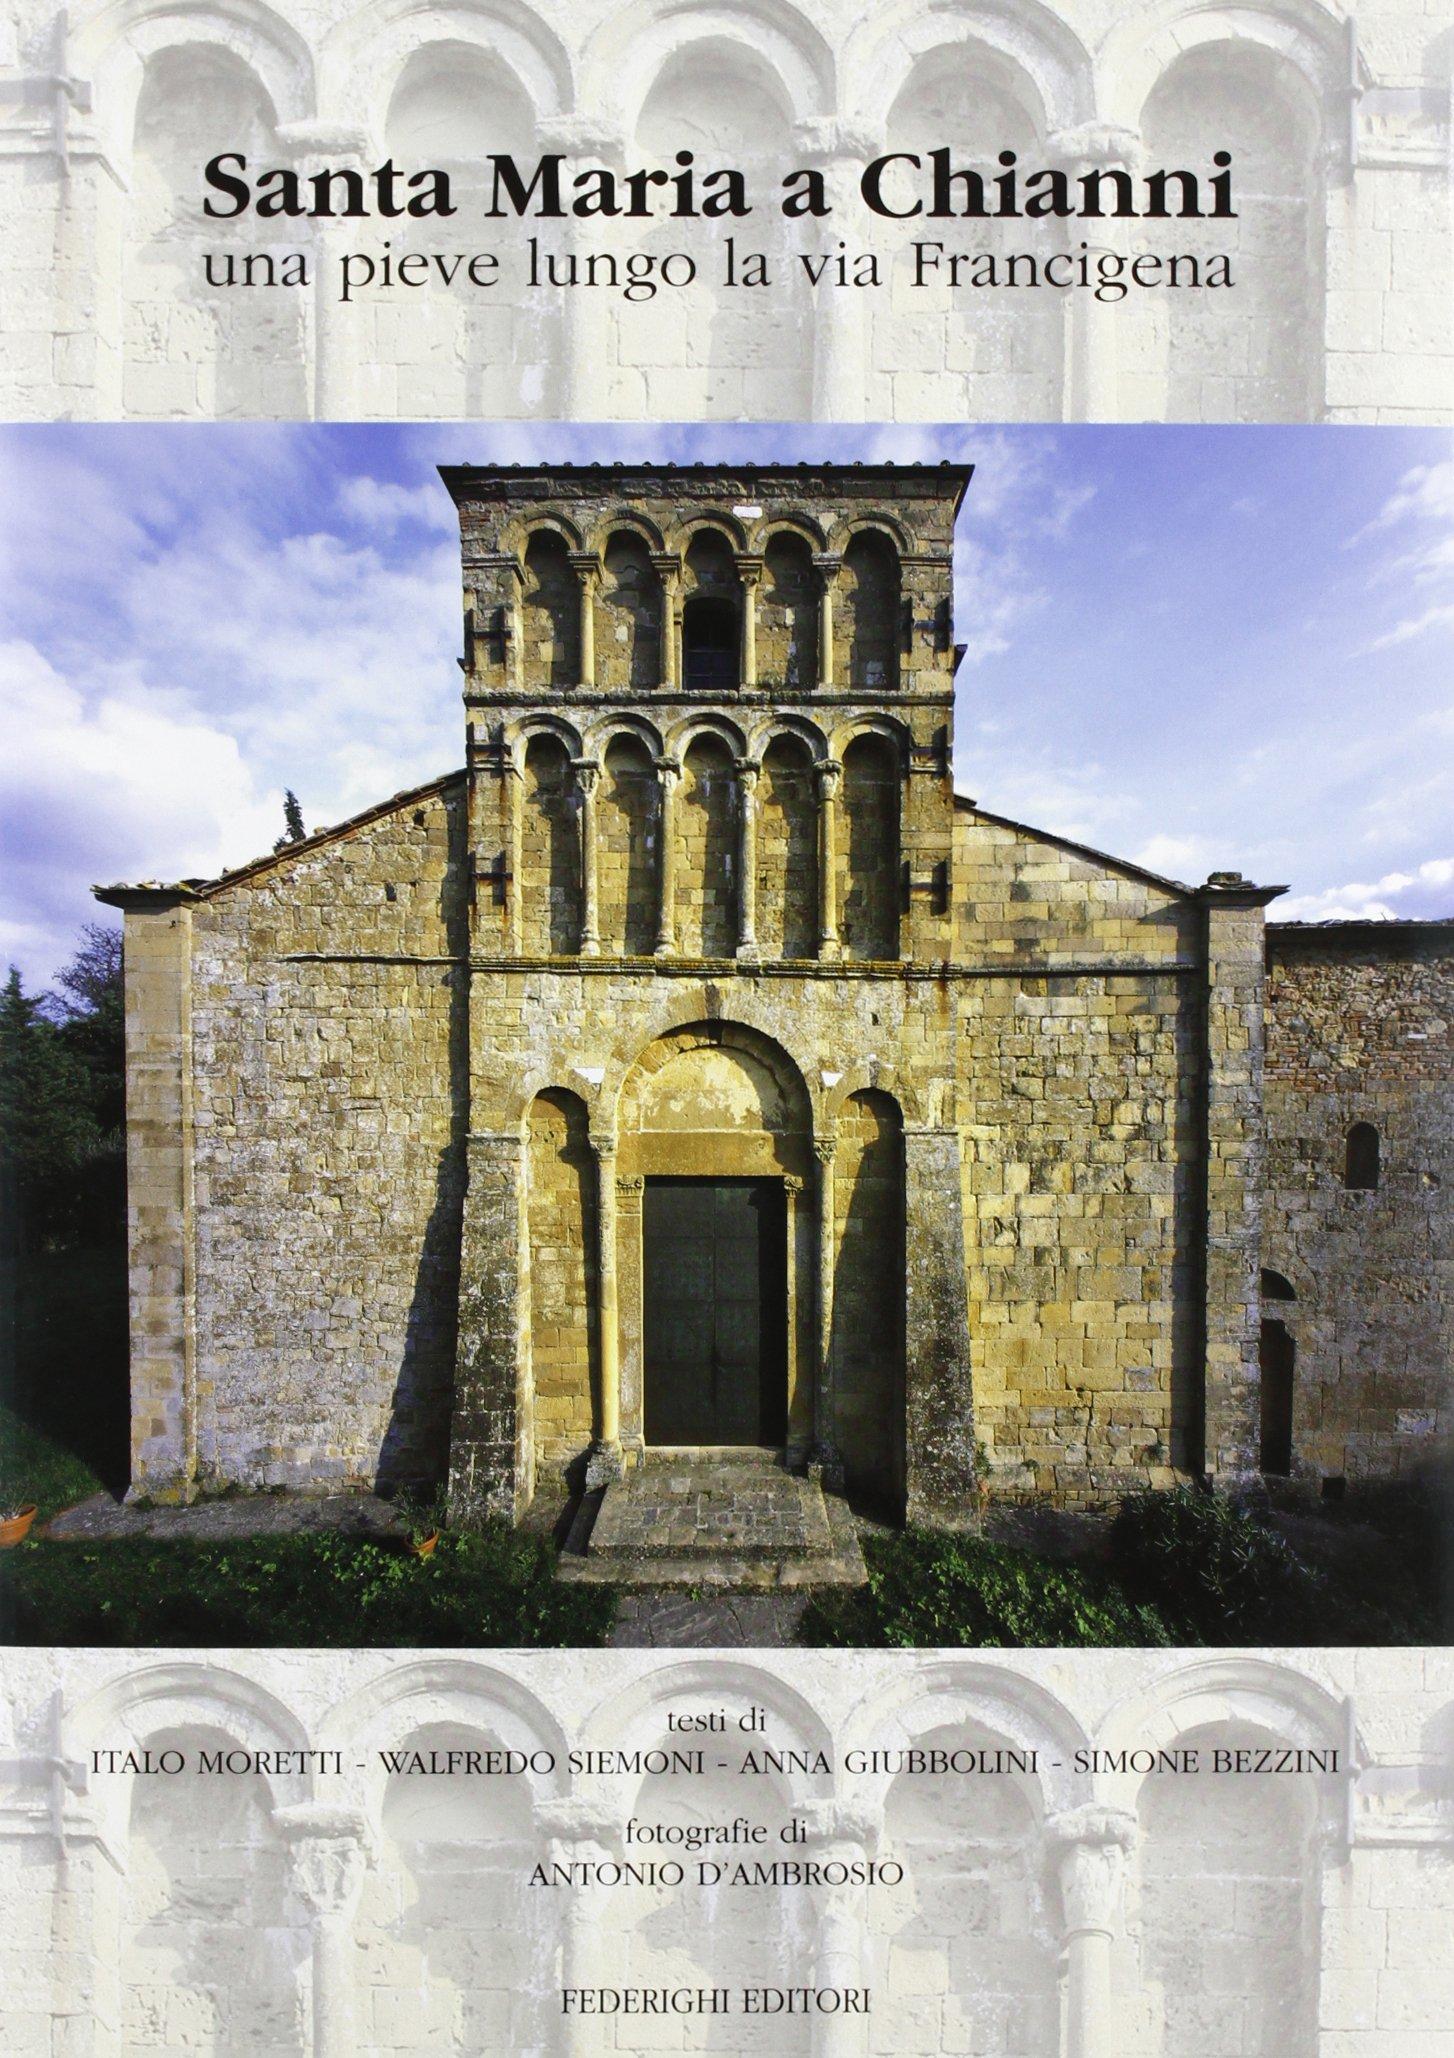 Santa Maria a Chianni. Una pieve lungo la via Francigena